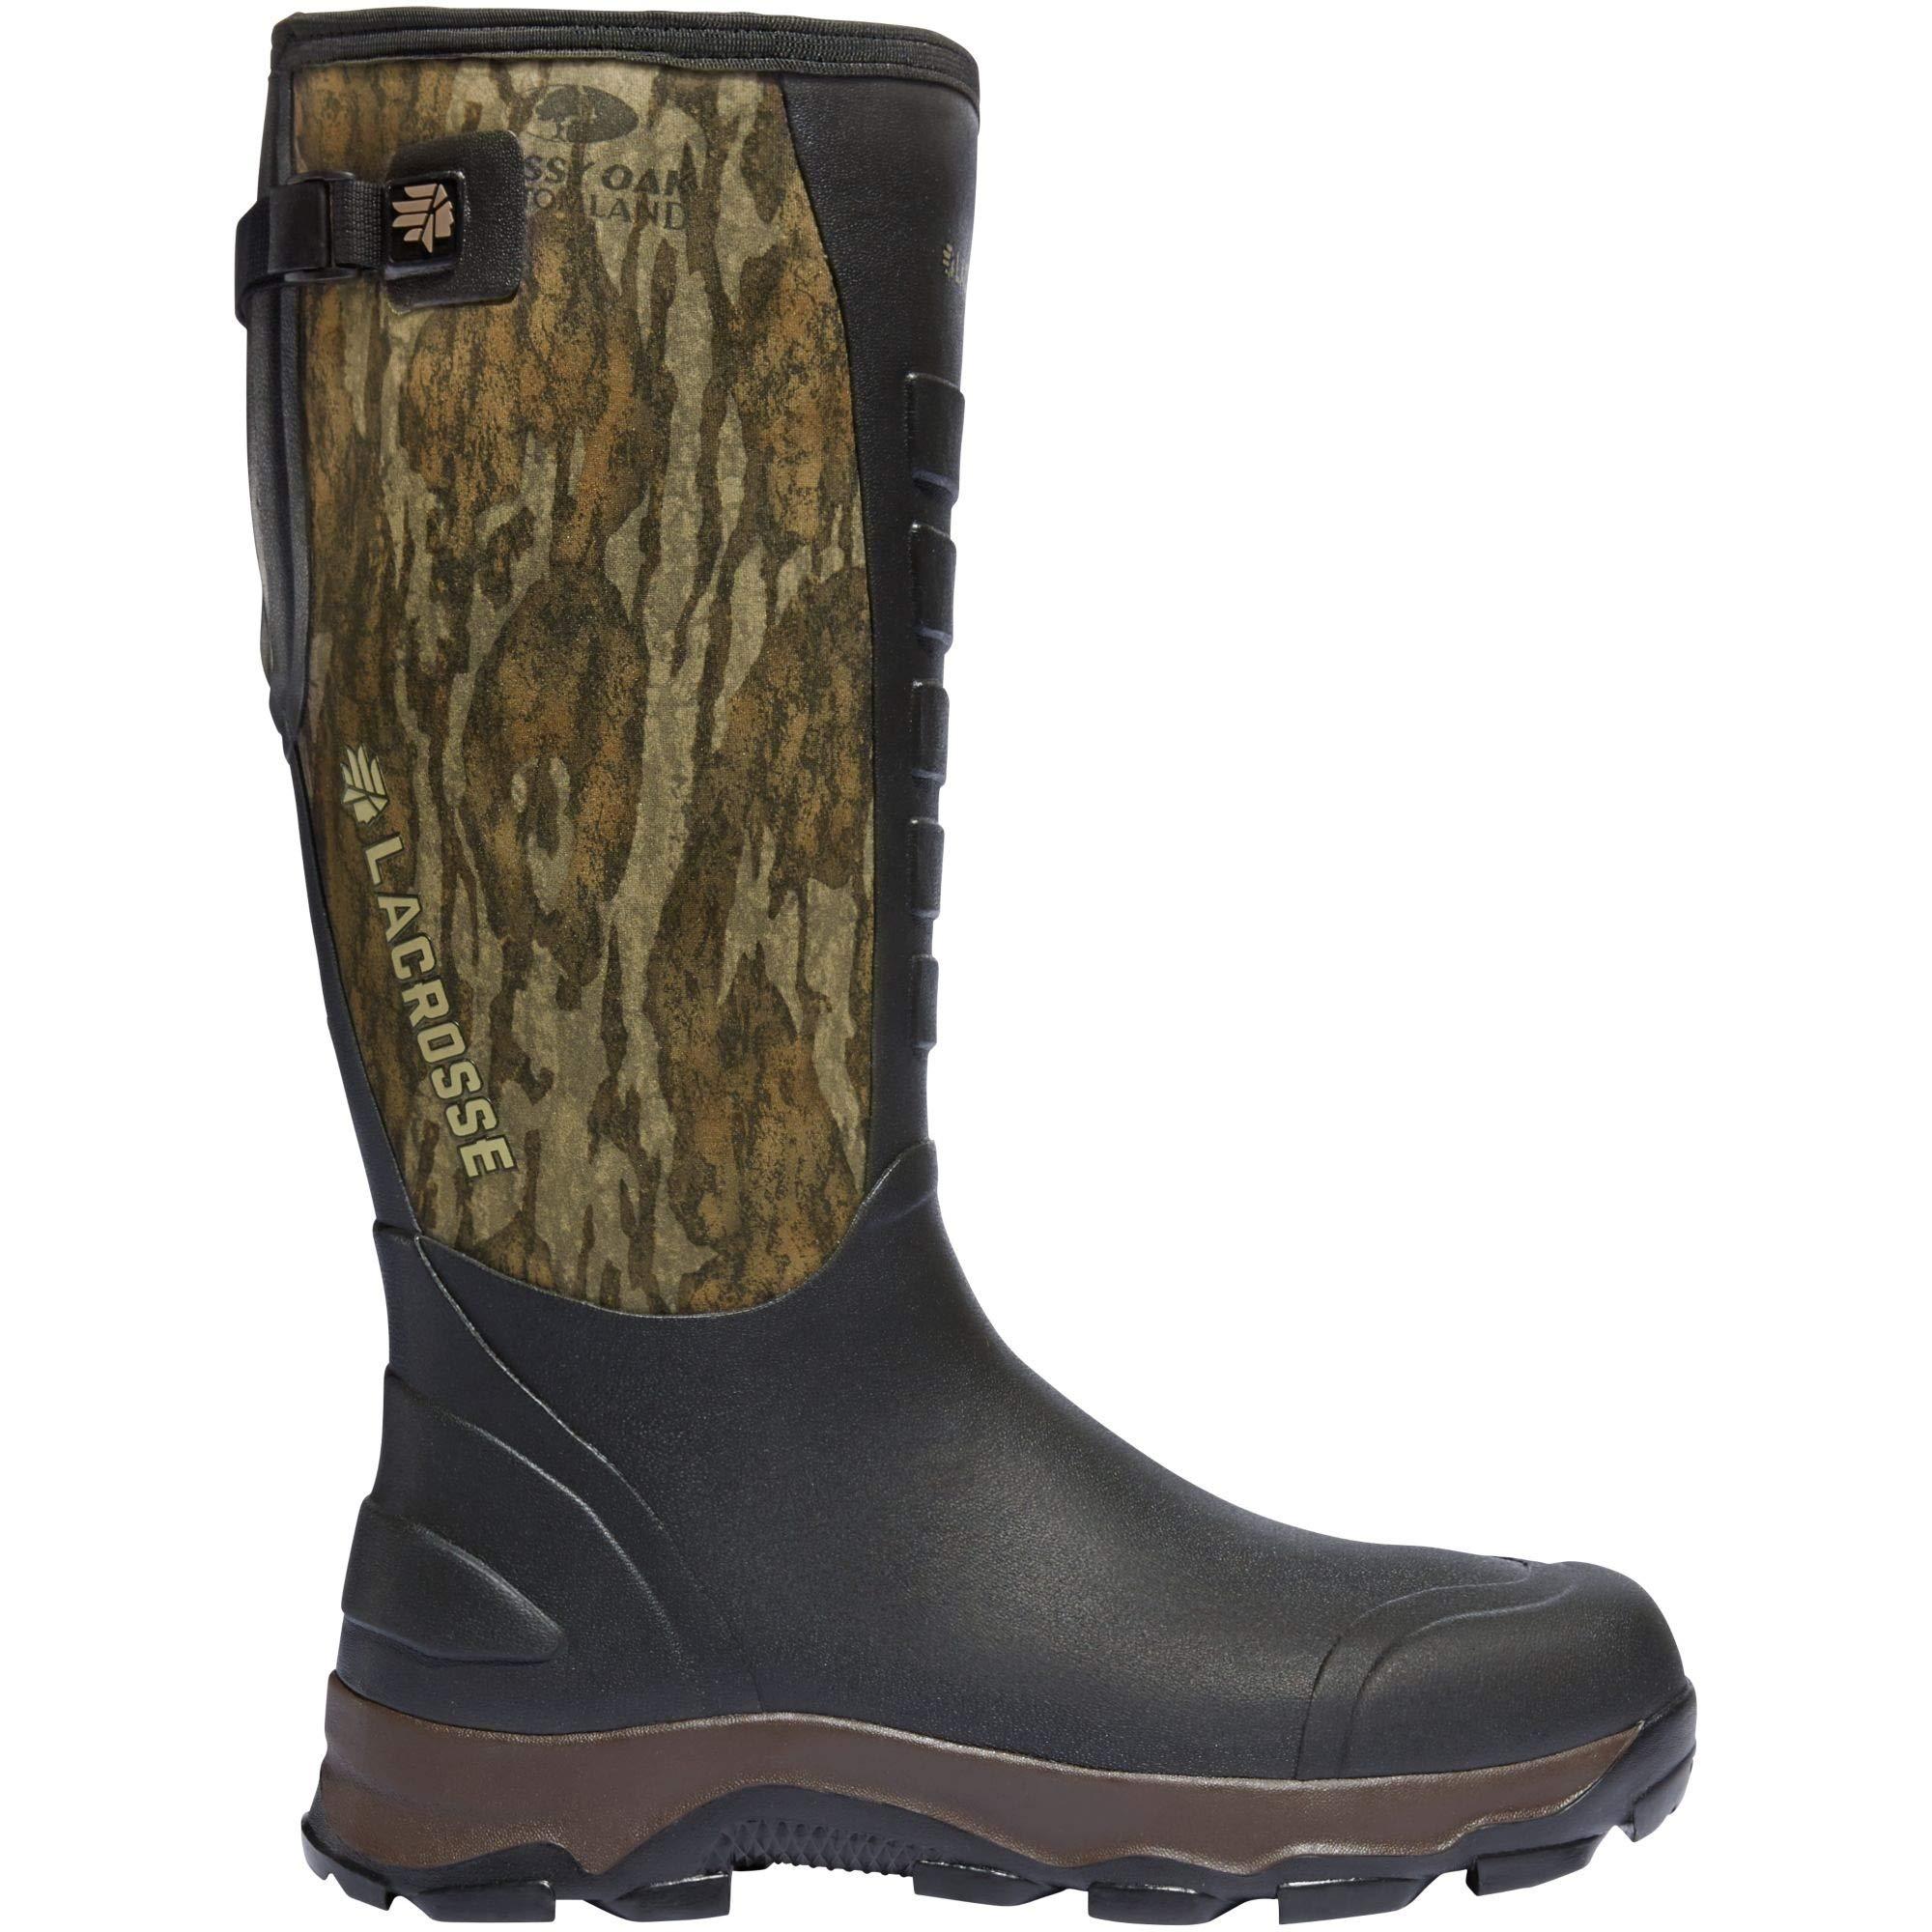 Lacrosse Men's 4xAlpha 16'' Hunting Boot, Mossy Oak Bottomland, 7 M